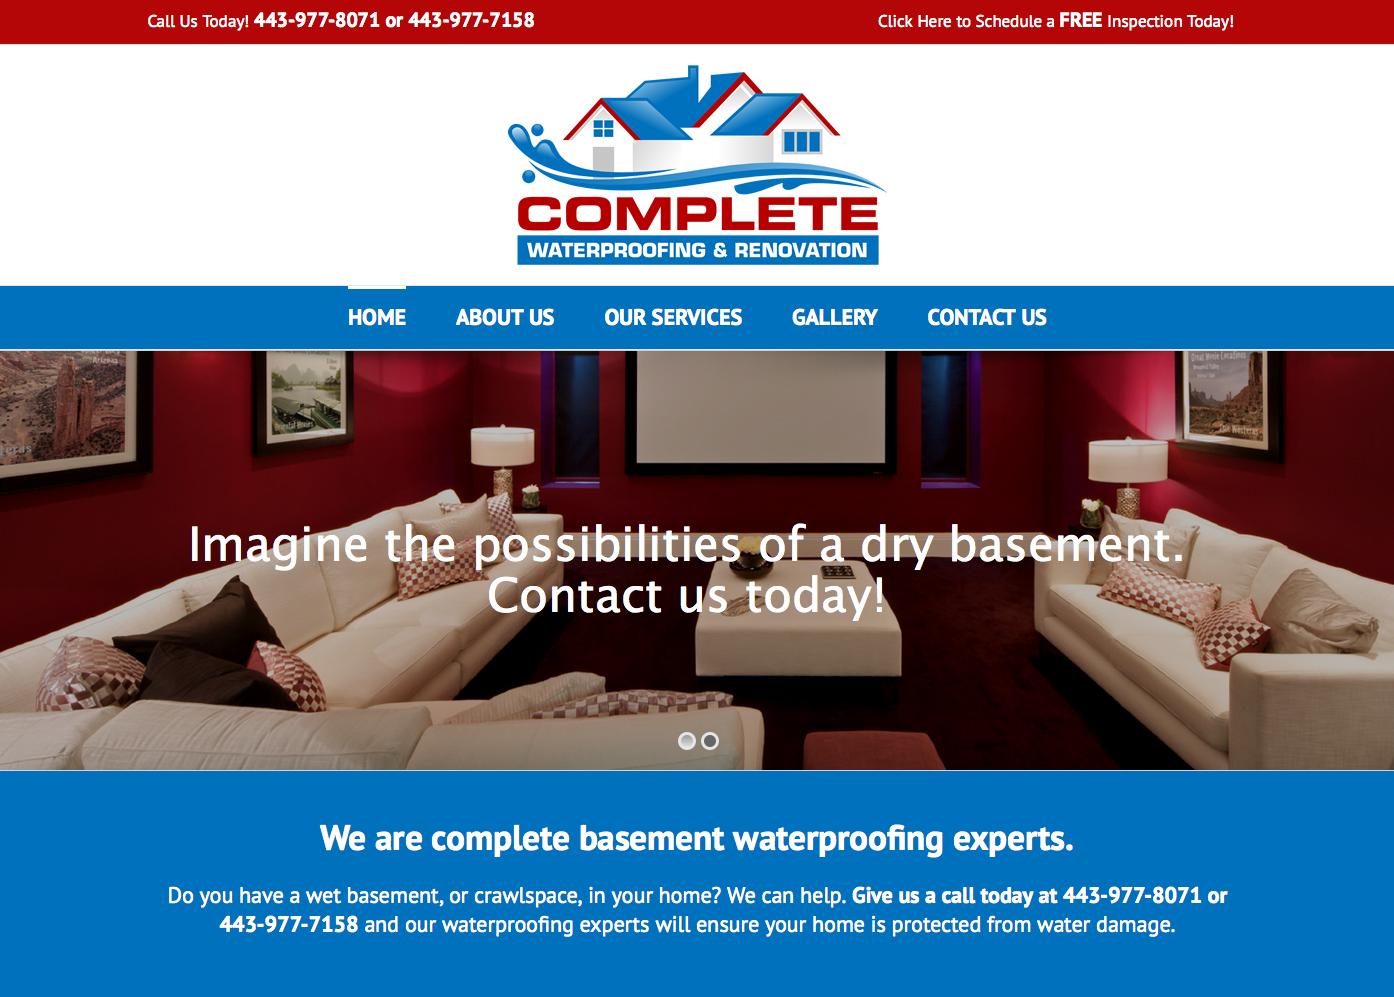 Website, Branding (and more!) for Complete Waterproofing & Renovation - Eyler Creative